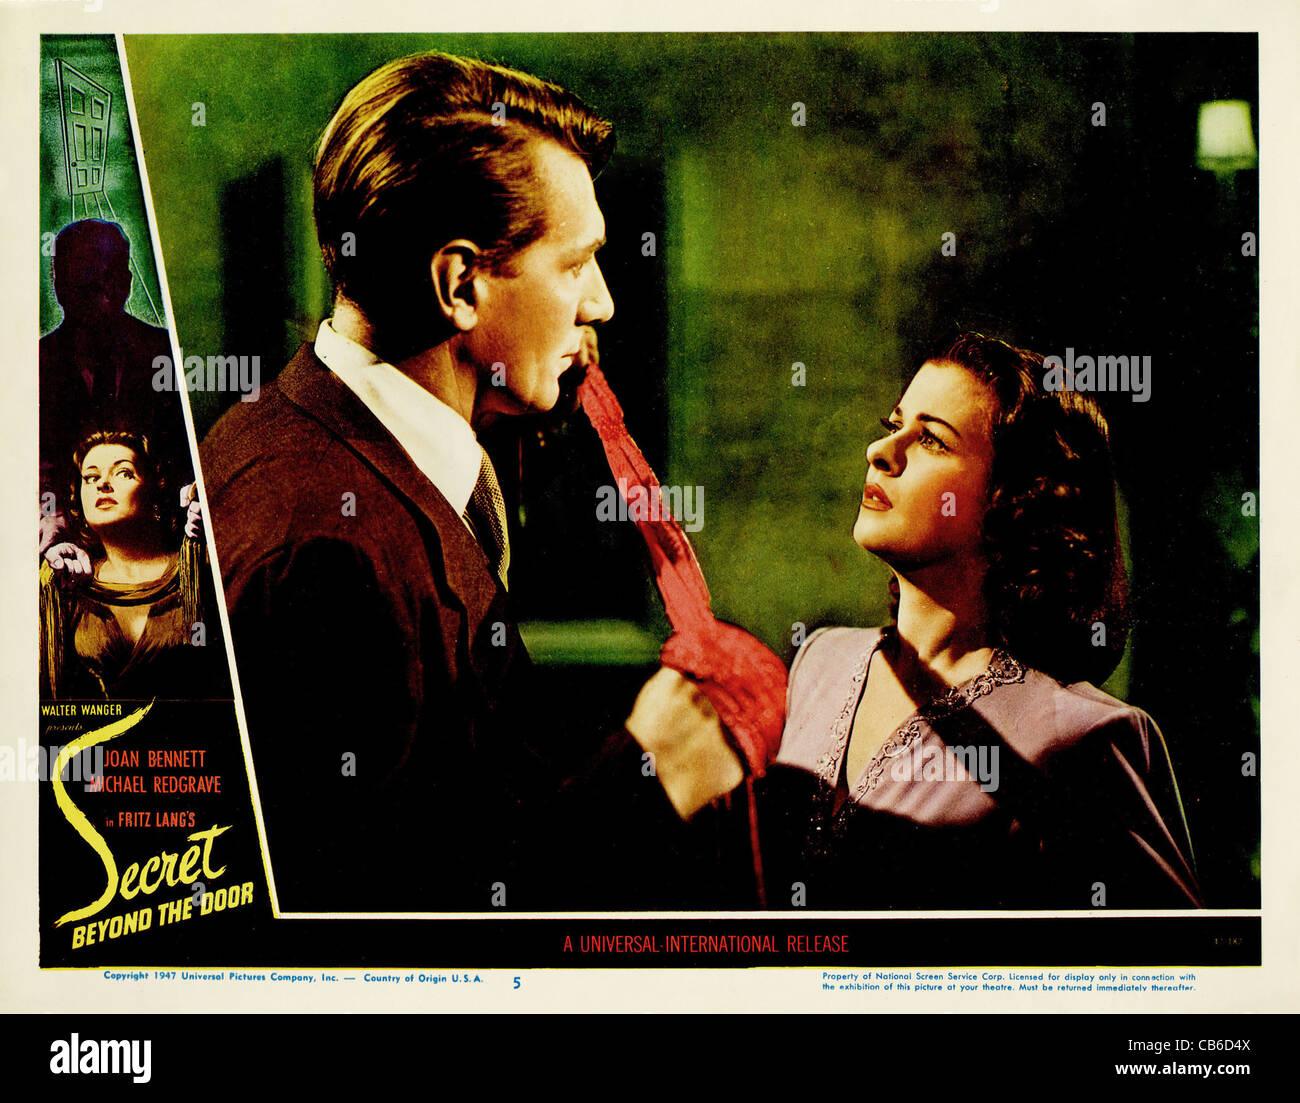 SECRET BEYOND THE DOOR... (1947) FRITZ LANG (DIR) JOAN BENNETT, MICHAEL REDGRAVE 001 MOVIESTORE COLLECTION LTD - Stock Image